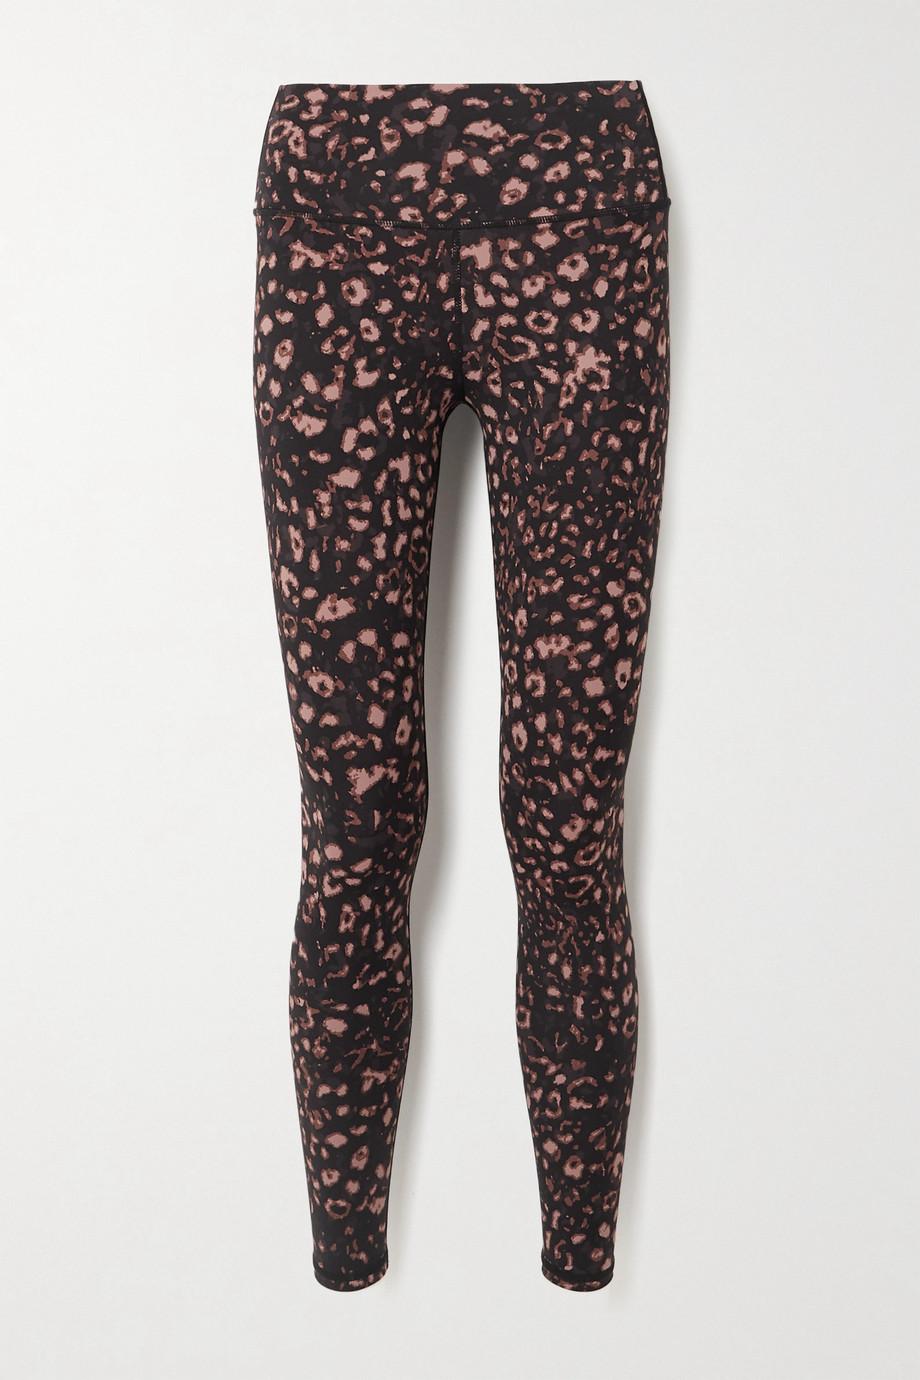 Varley Luna leopard-print stretch leggings